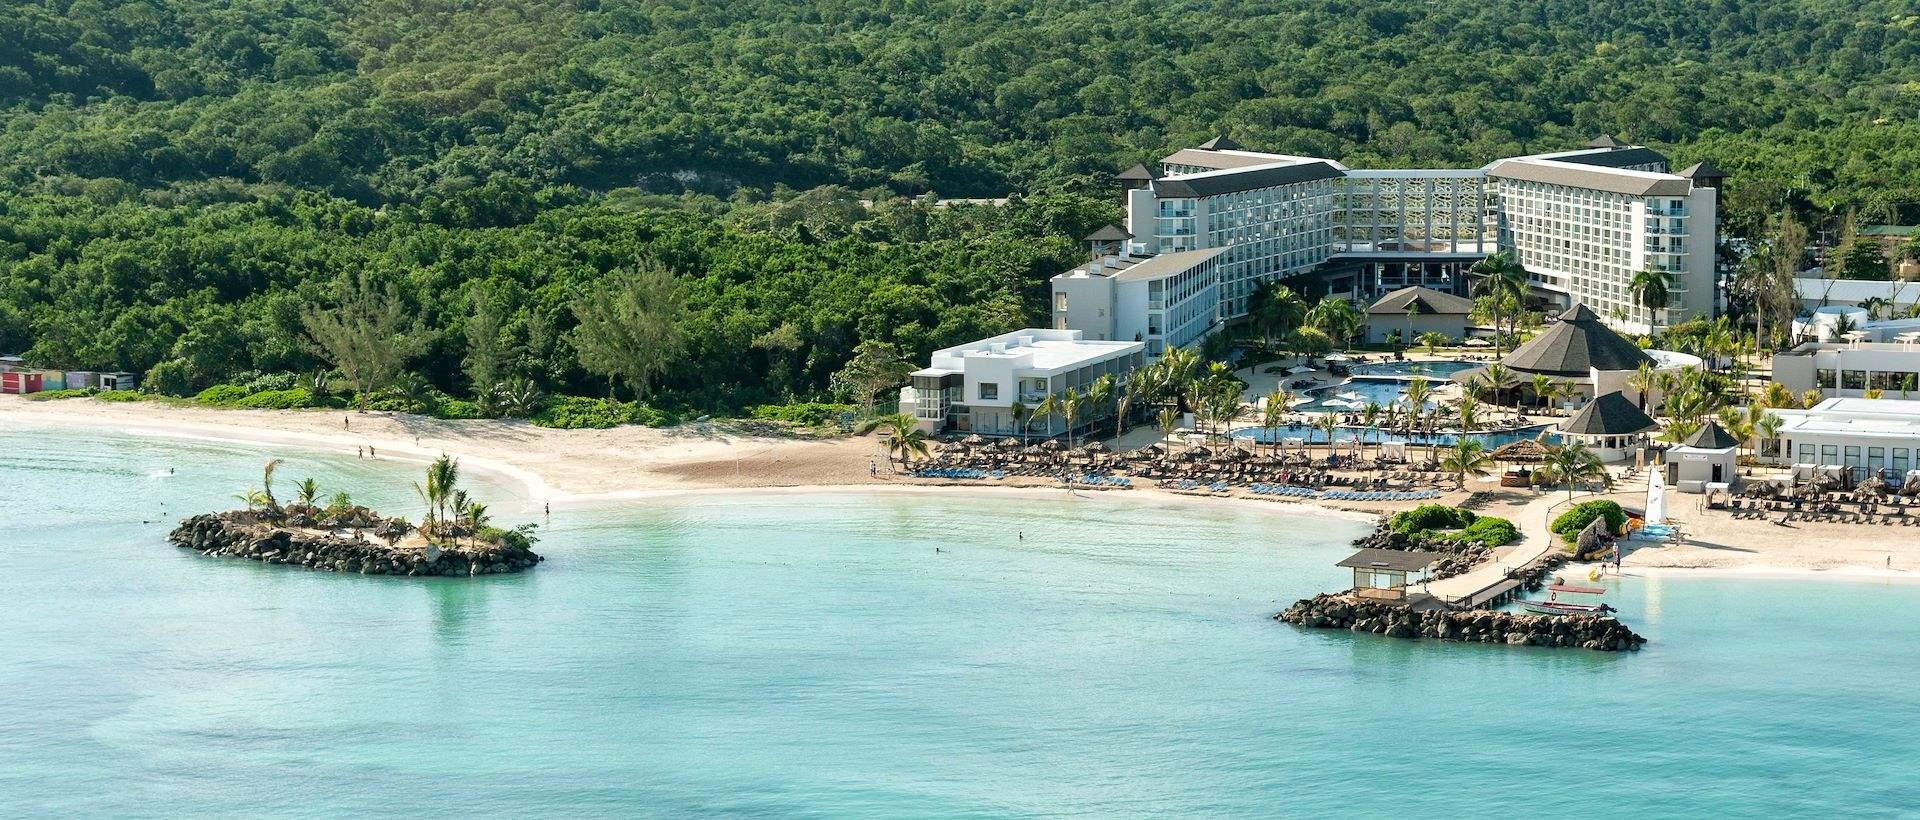 Royalton White Sands Montego Bay - Marriott All-Inclusive Resor